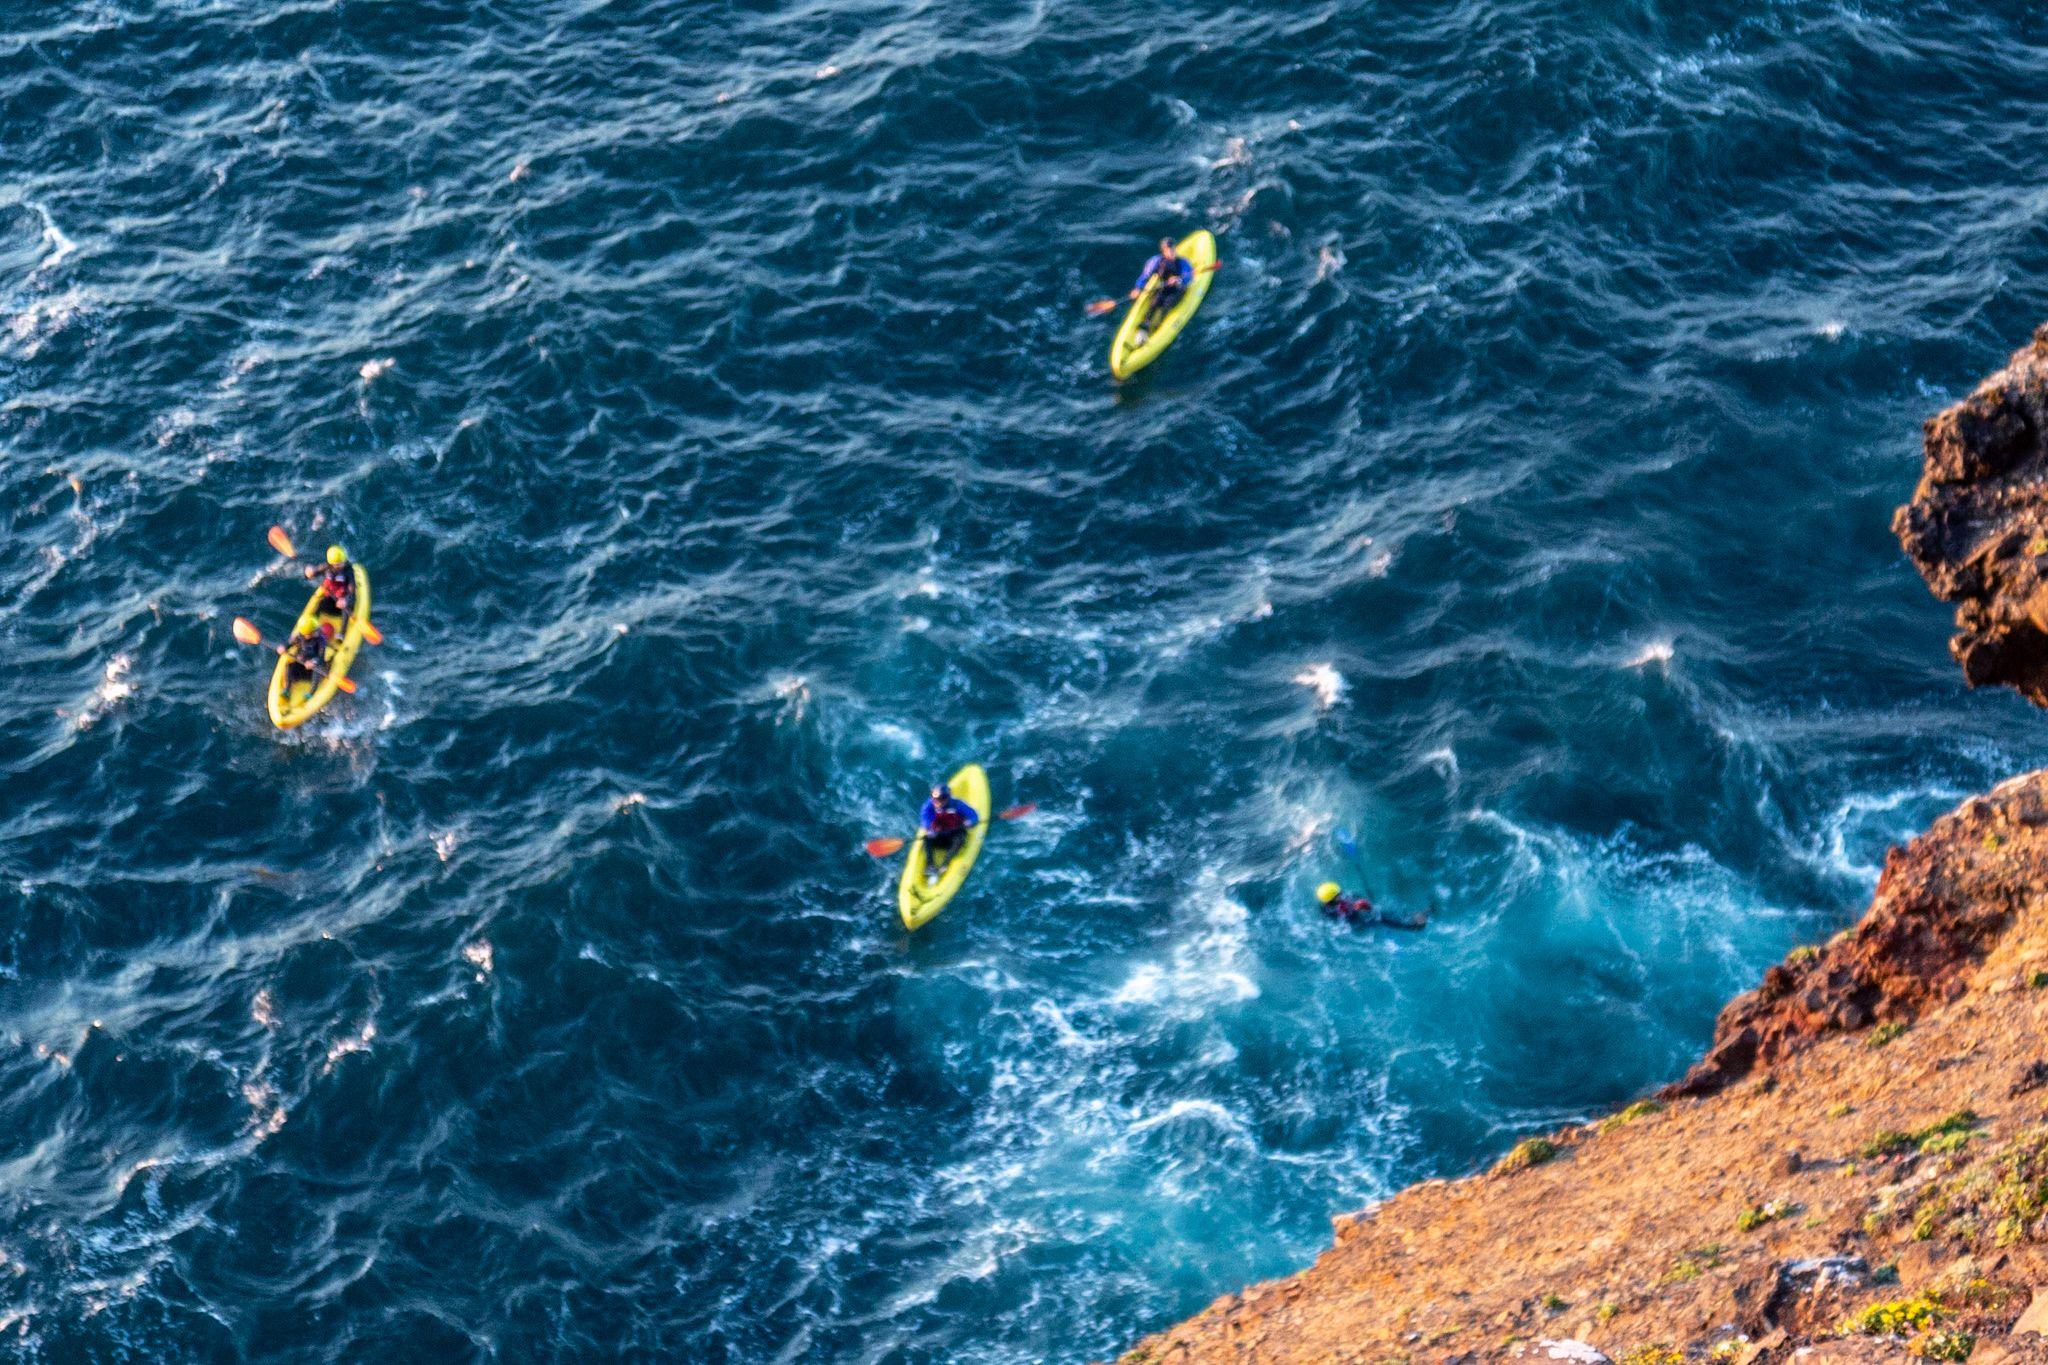 Kayaking at Santa Cruz Island